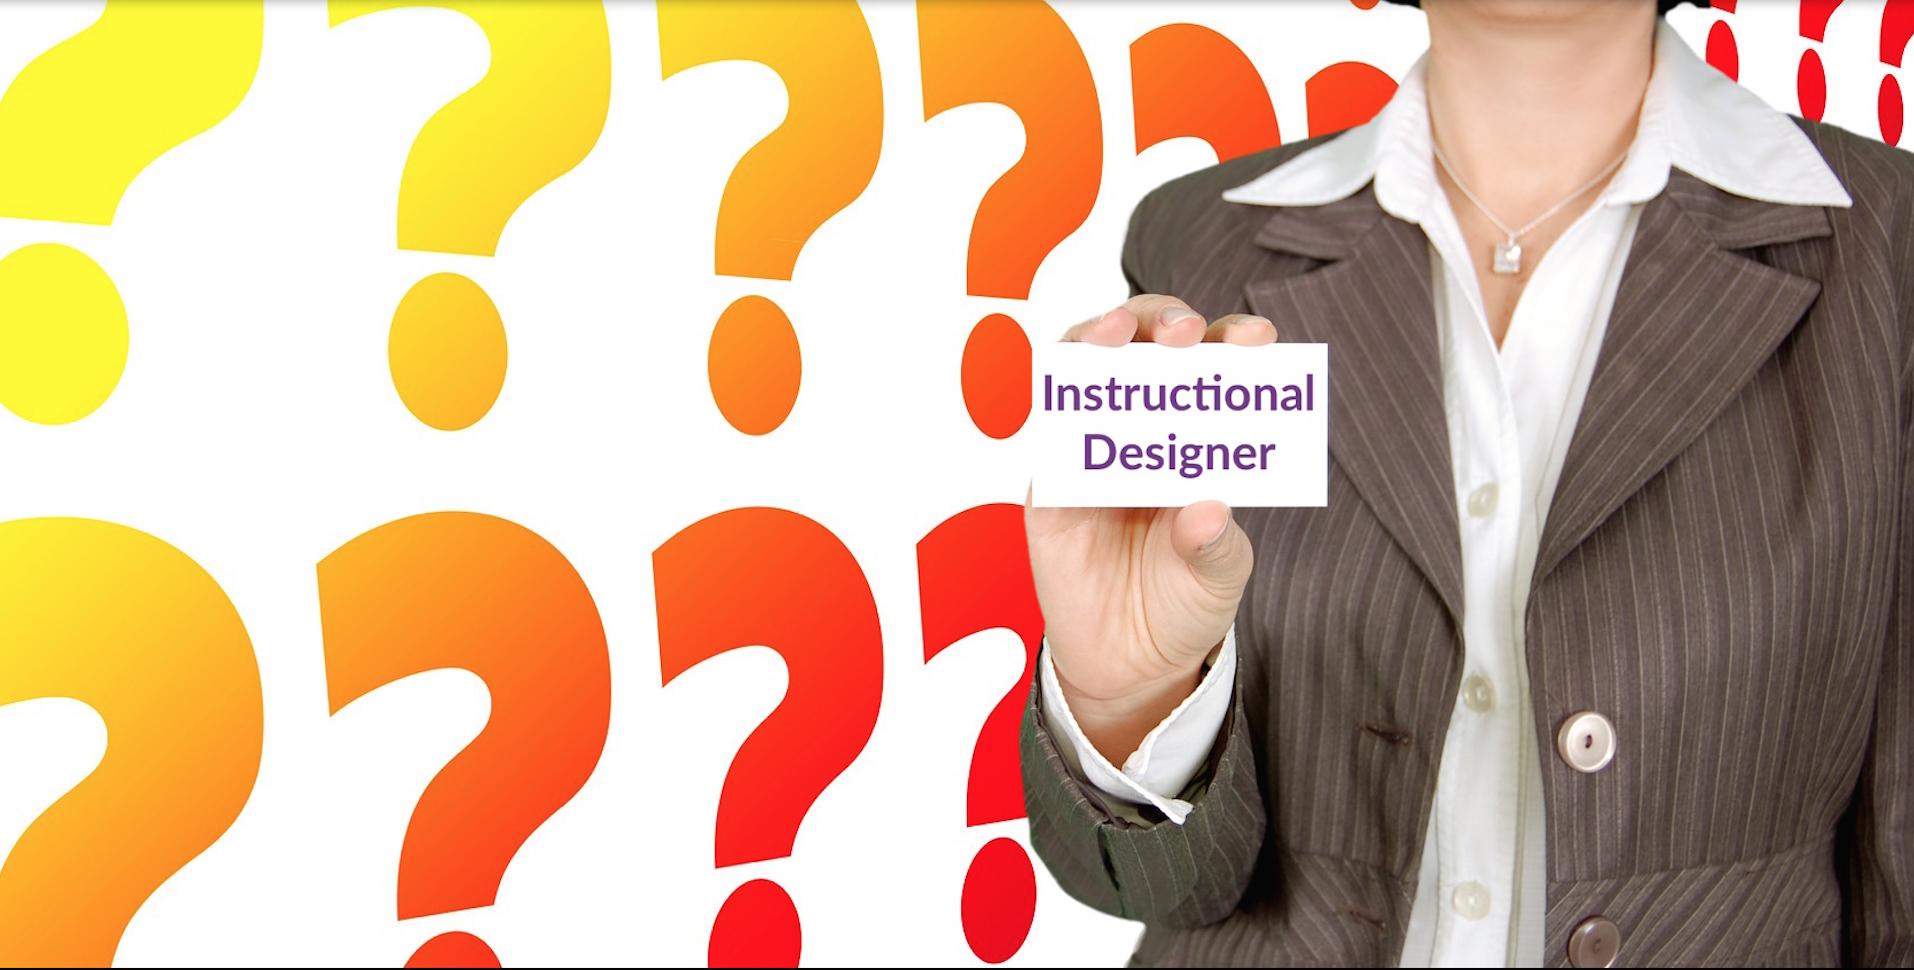 CATMEDIA Training Services Instructional Designer Business Card